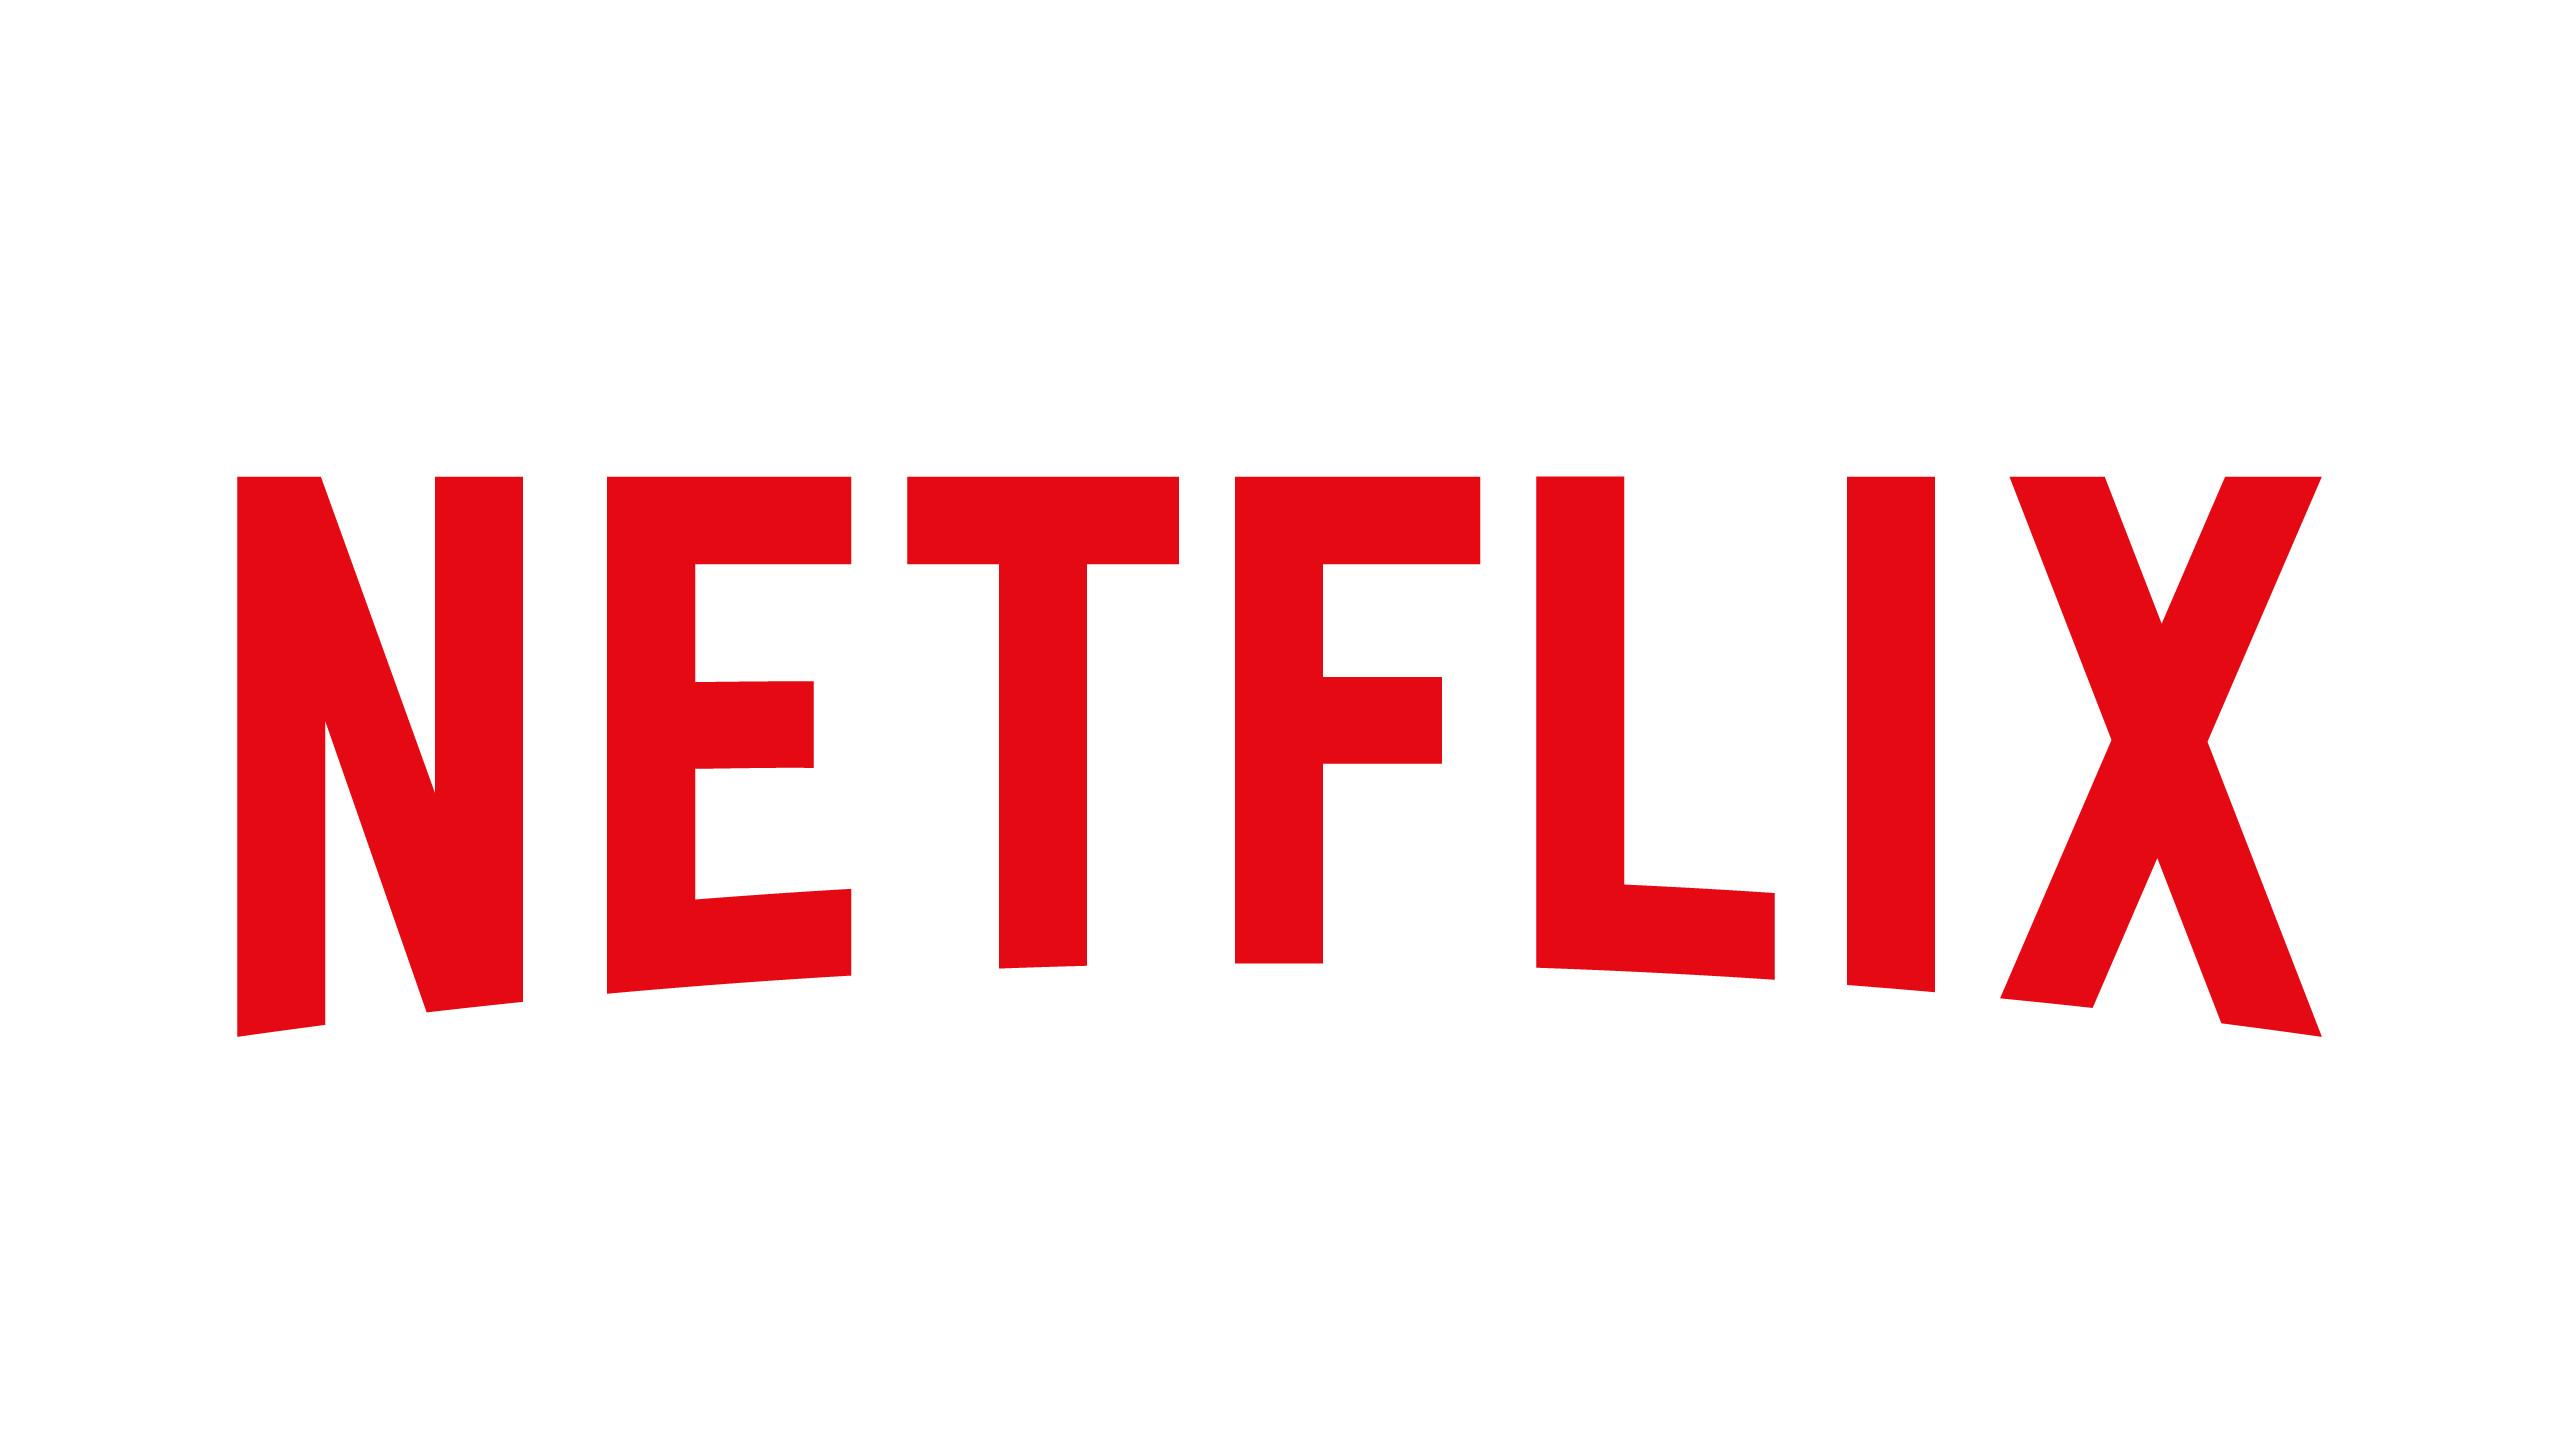 Netflix Wallpaper hd free download